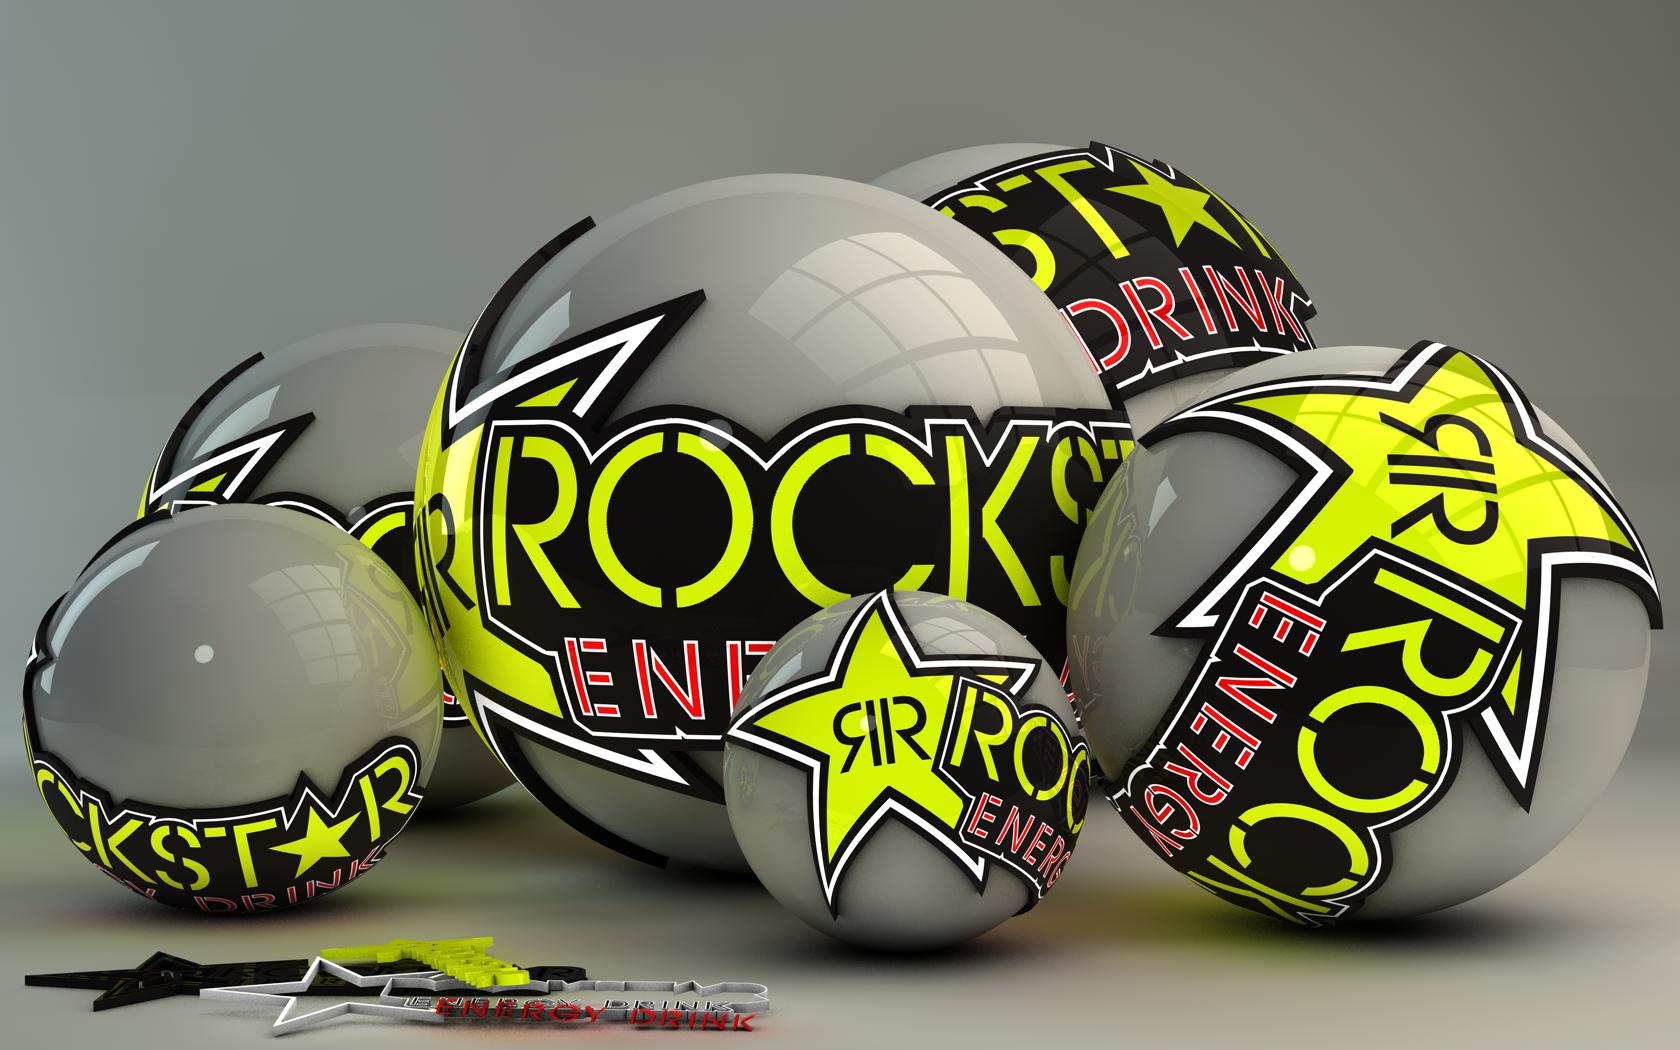 Rockstar Energy Drink Logo Wallpaper Rockstar energy drink logo 1680x1050